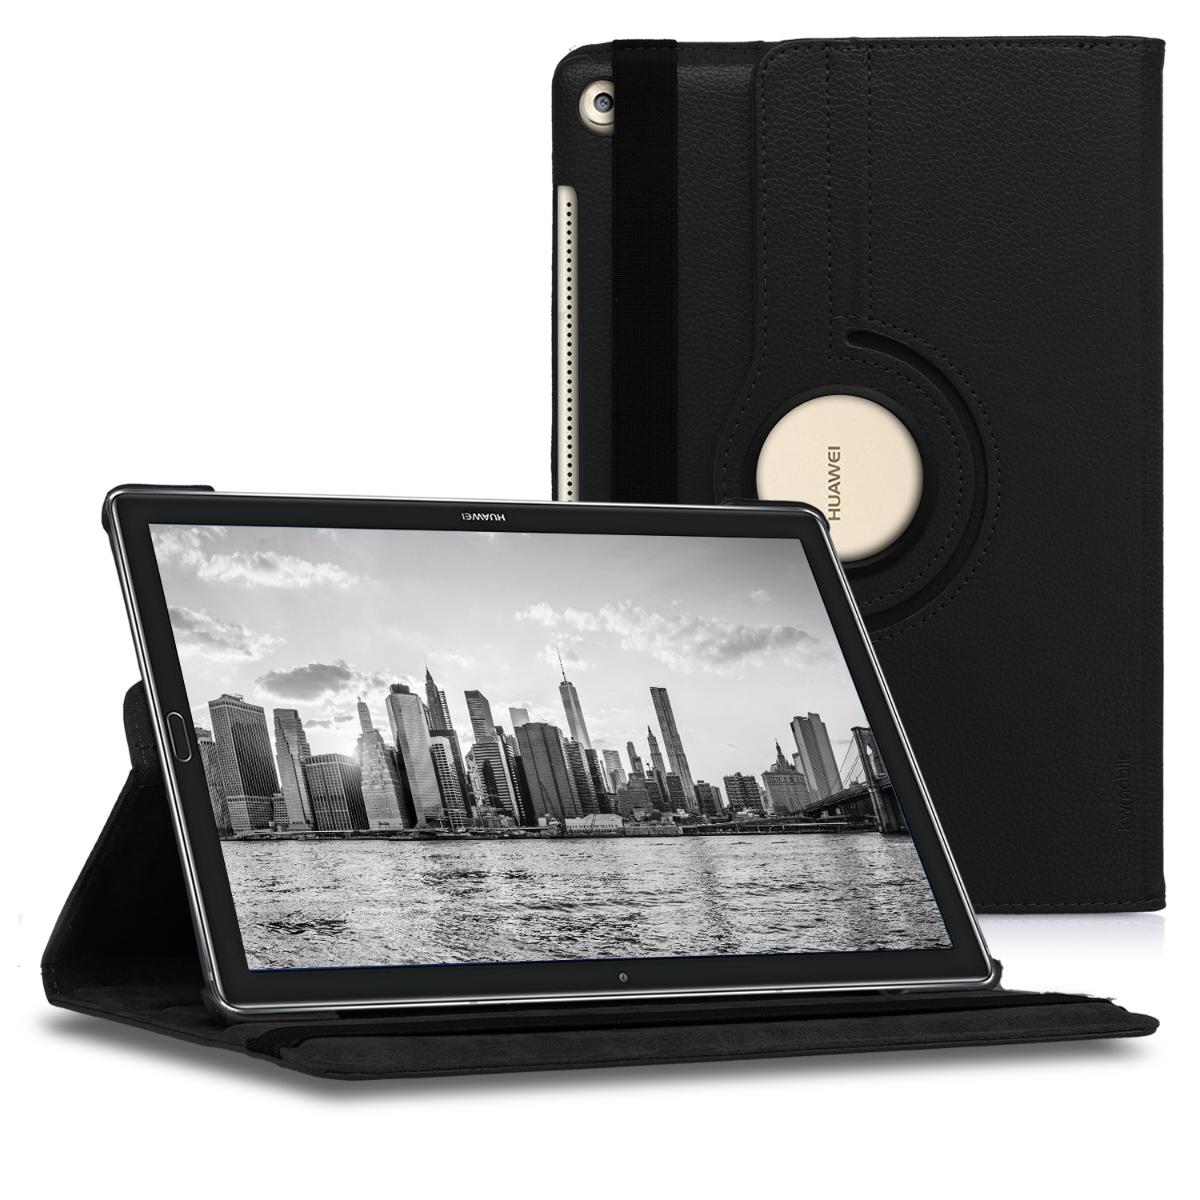 KW Θήκη 360° Huawei MediaPad M5 10.8'' / M5 10 Pro - Black (44414.01)